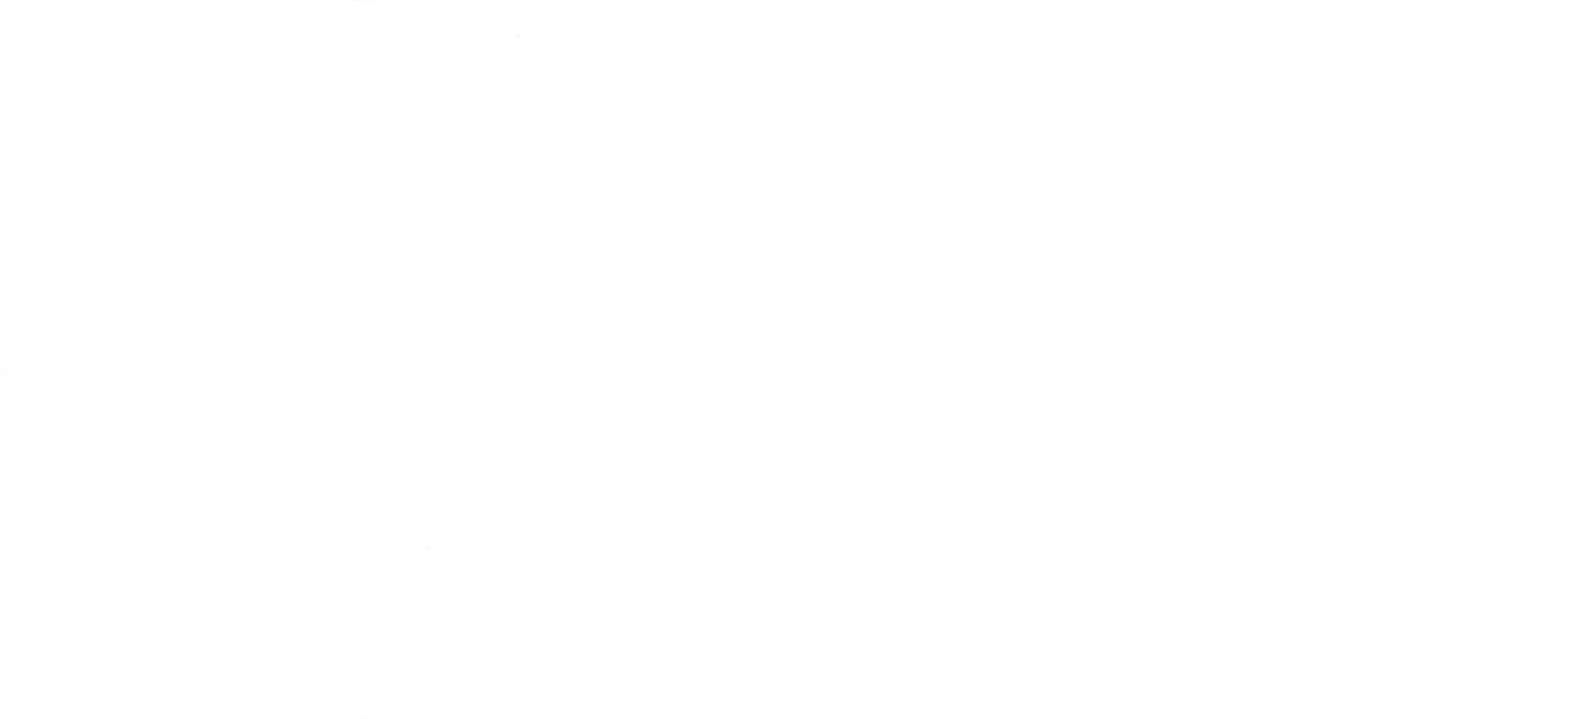 Aachen Drone Development Initiative